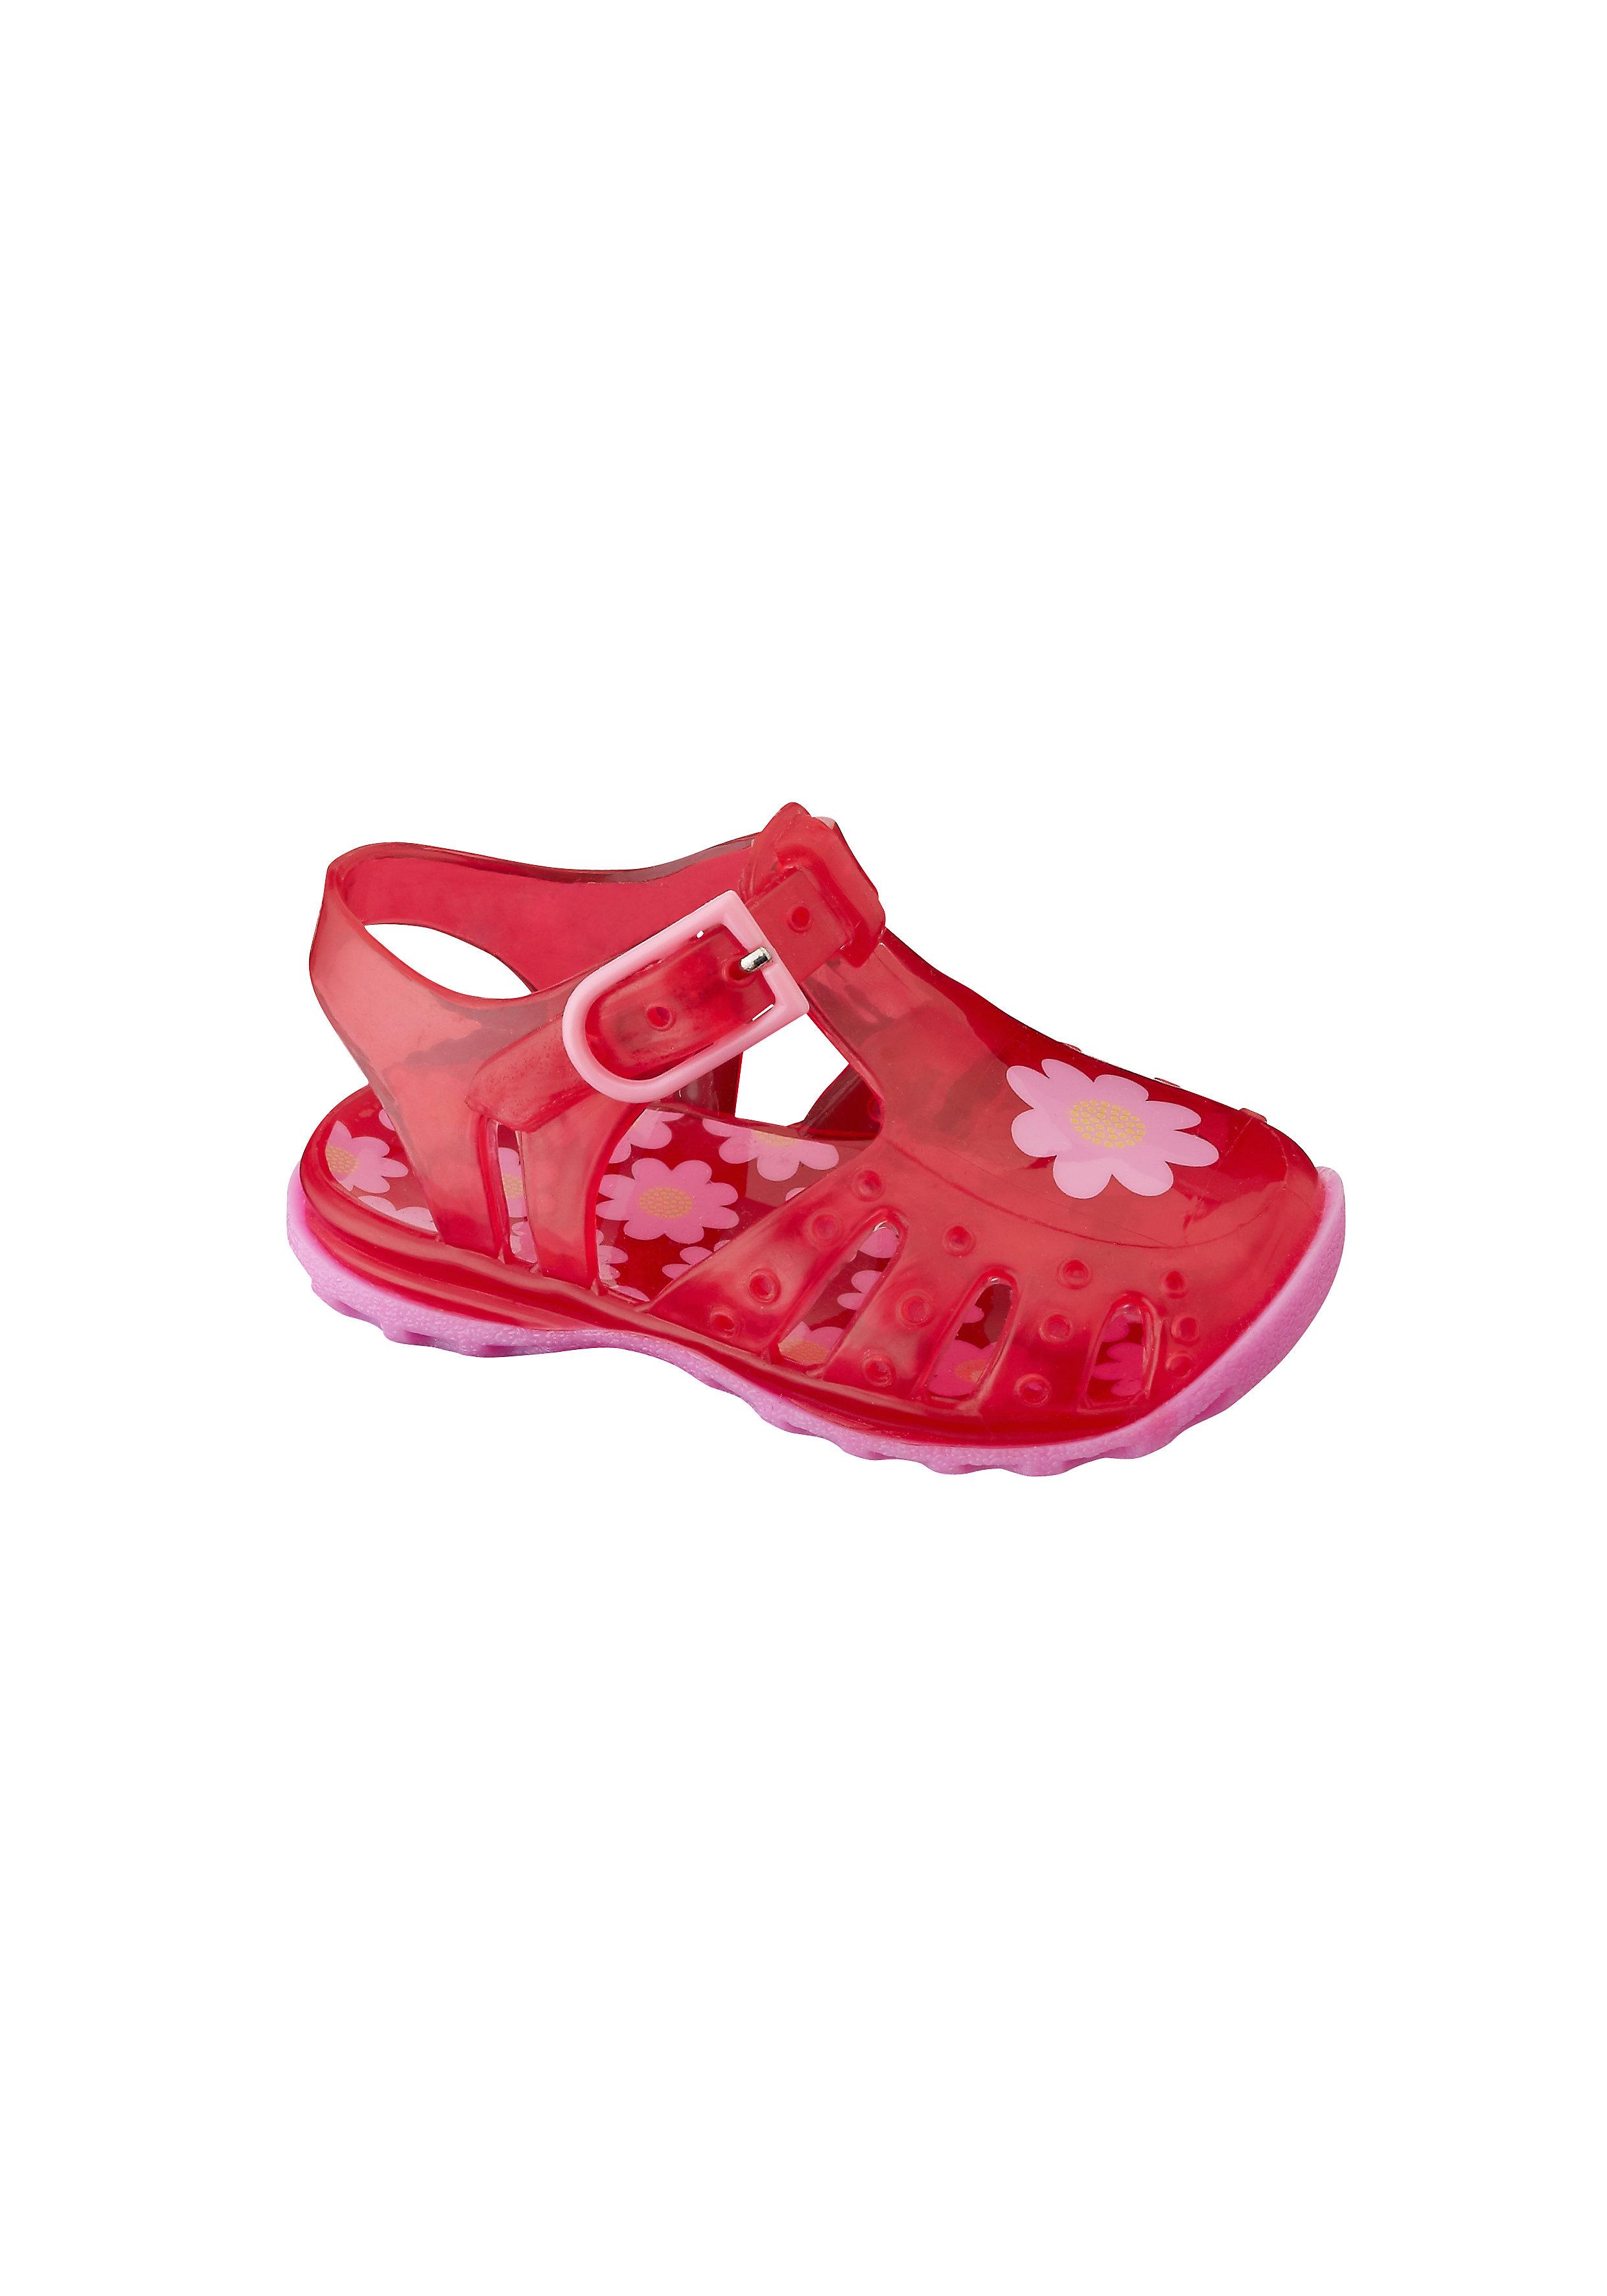 Mothercare | Girls Sandals Flower Design - Red